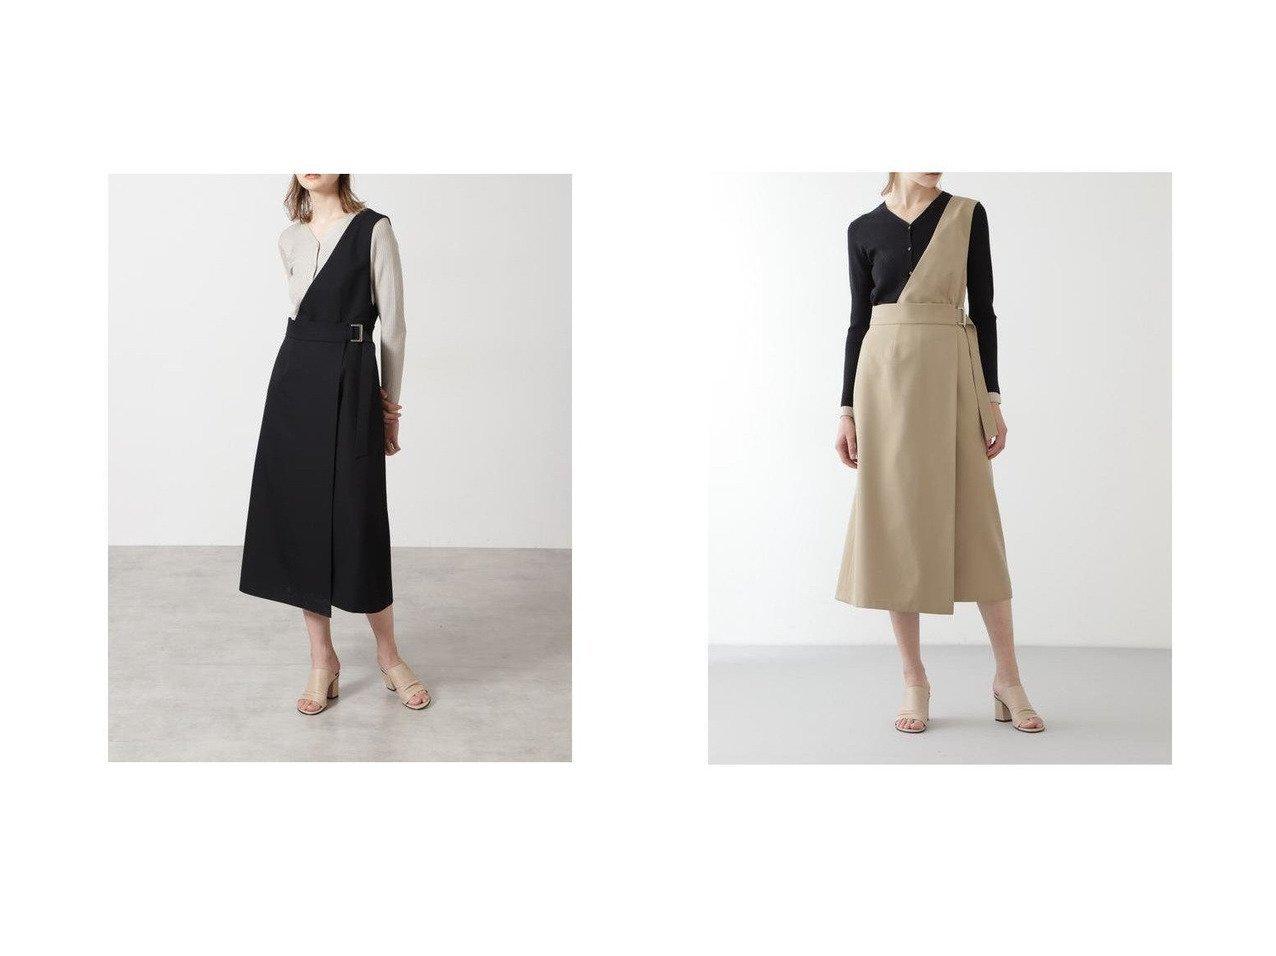 【BOSCH/ボッシュ】のワンショルダーラップワンピース BOSCHのおすすめ!人気、トレンド・レディースファッションの通販 おすすめで人気の流行・トレンド、ファッションの通販商品 メンズファッション・キッズファッション・インテリア・家具・レディースファッション・服の通販 founy(ファニー) https://founy.com/ ファッション Fashion レディースファッション WOMEN ワンピース Dress インナー ショルダー シンプル スタンダード トレンド ラップ |ID:crp329100000019941